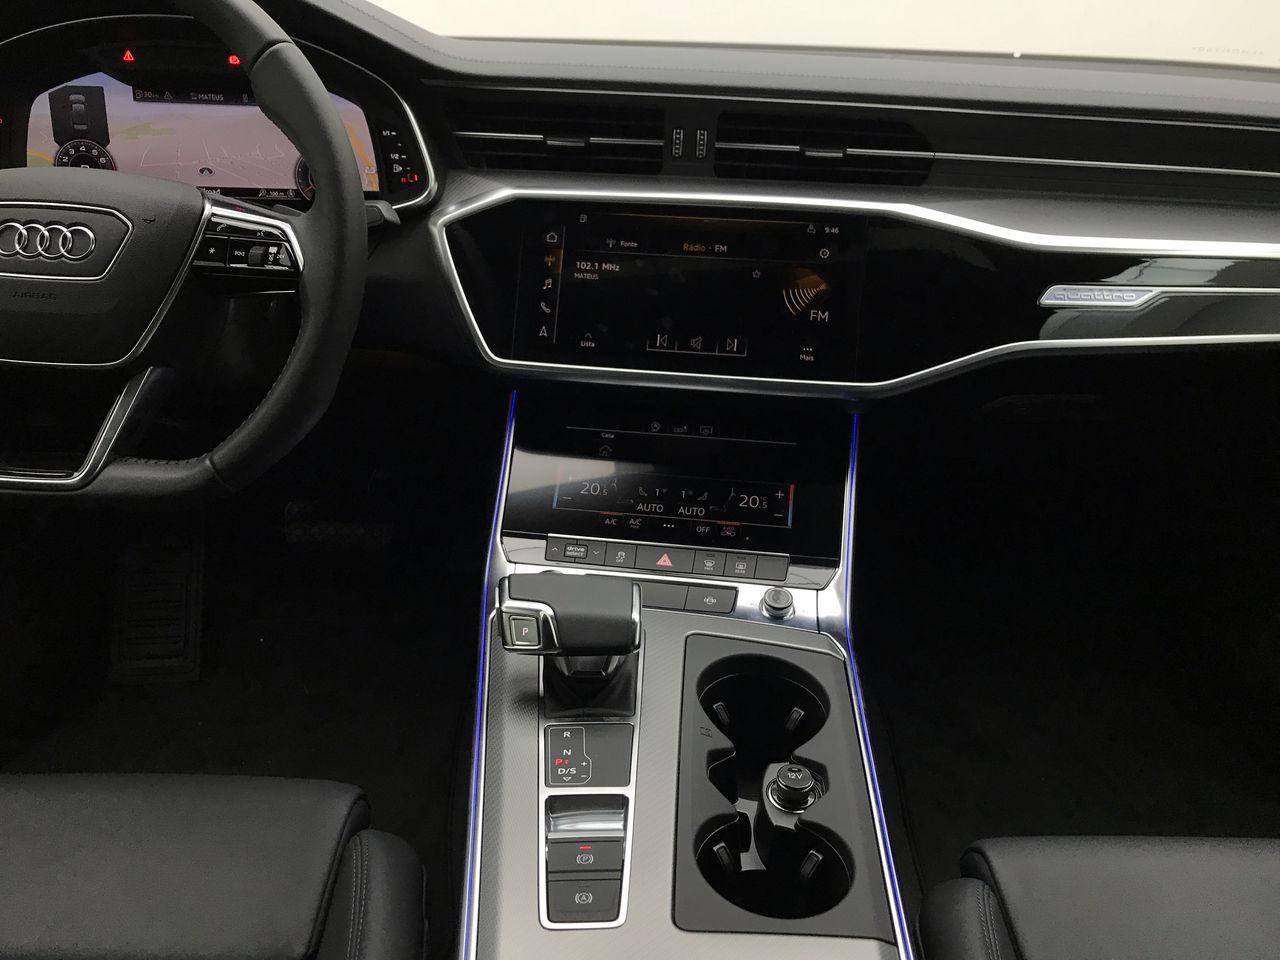 A6 Performance 3.0 TFSI Quattro S.tronic